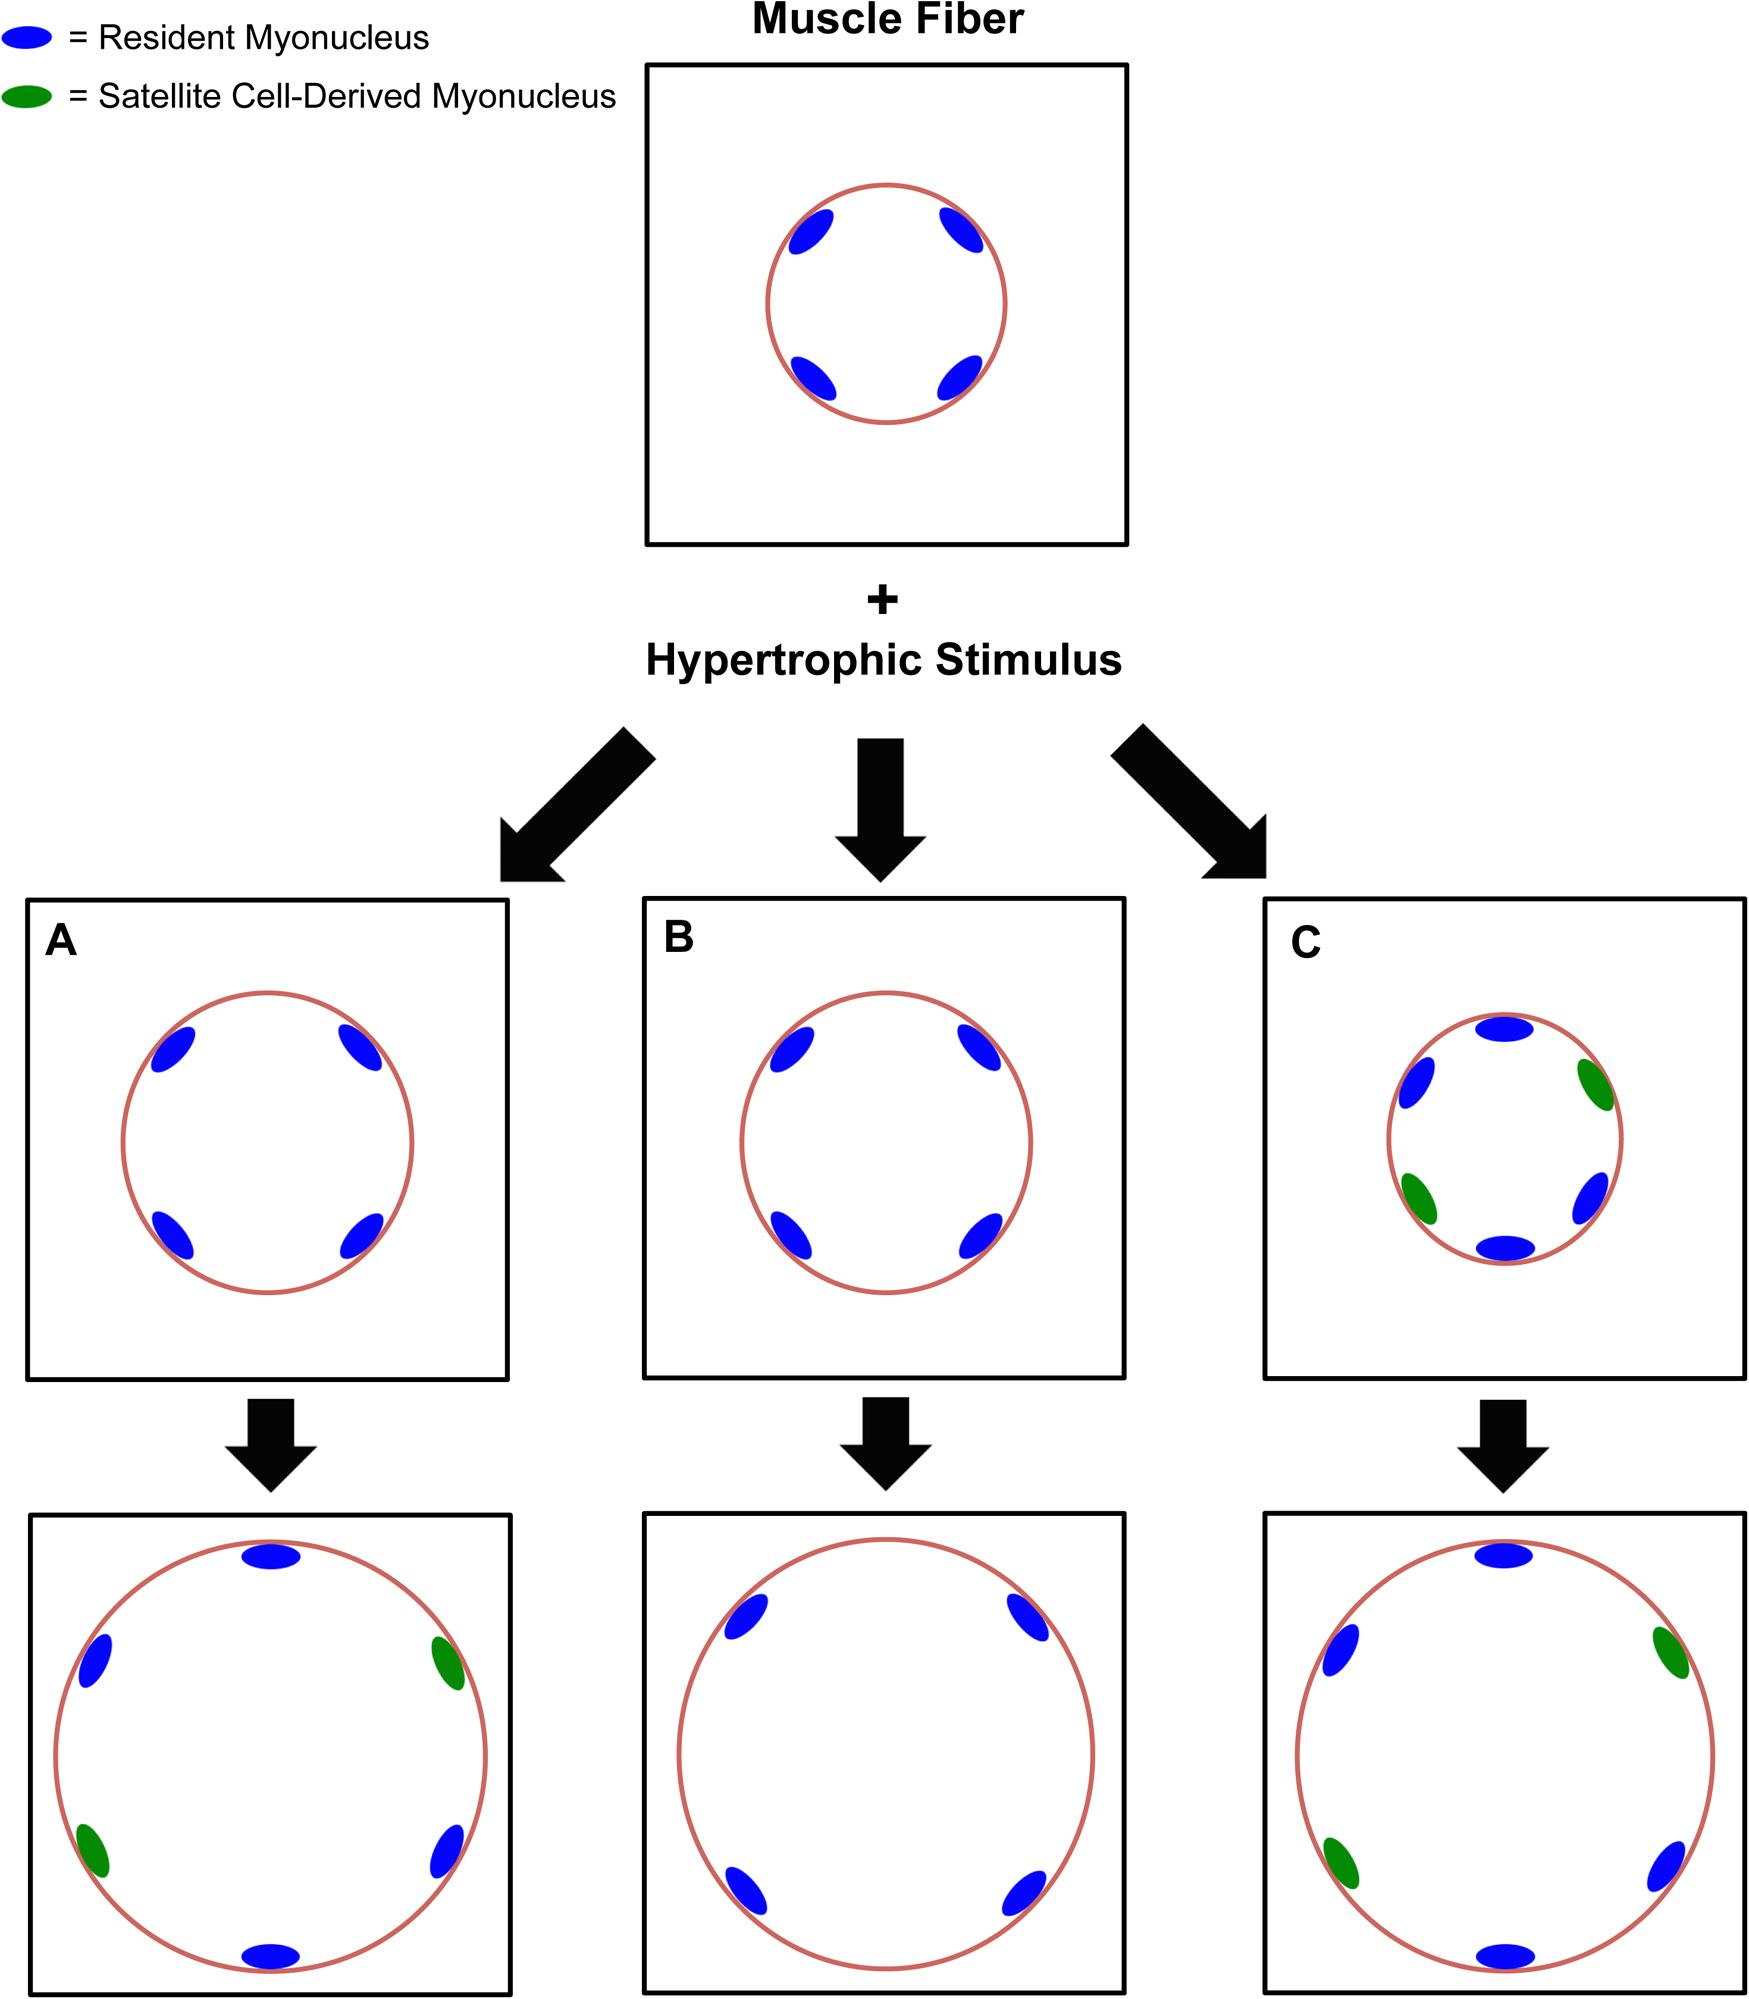 fphys 09 00635 g001 frontiers myonuclear domain flexibility challenges rigid